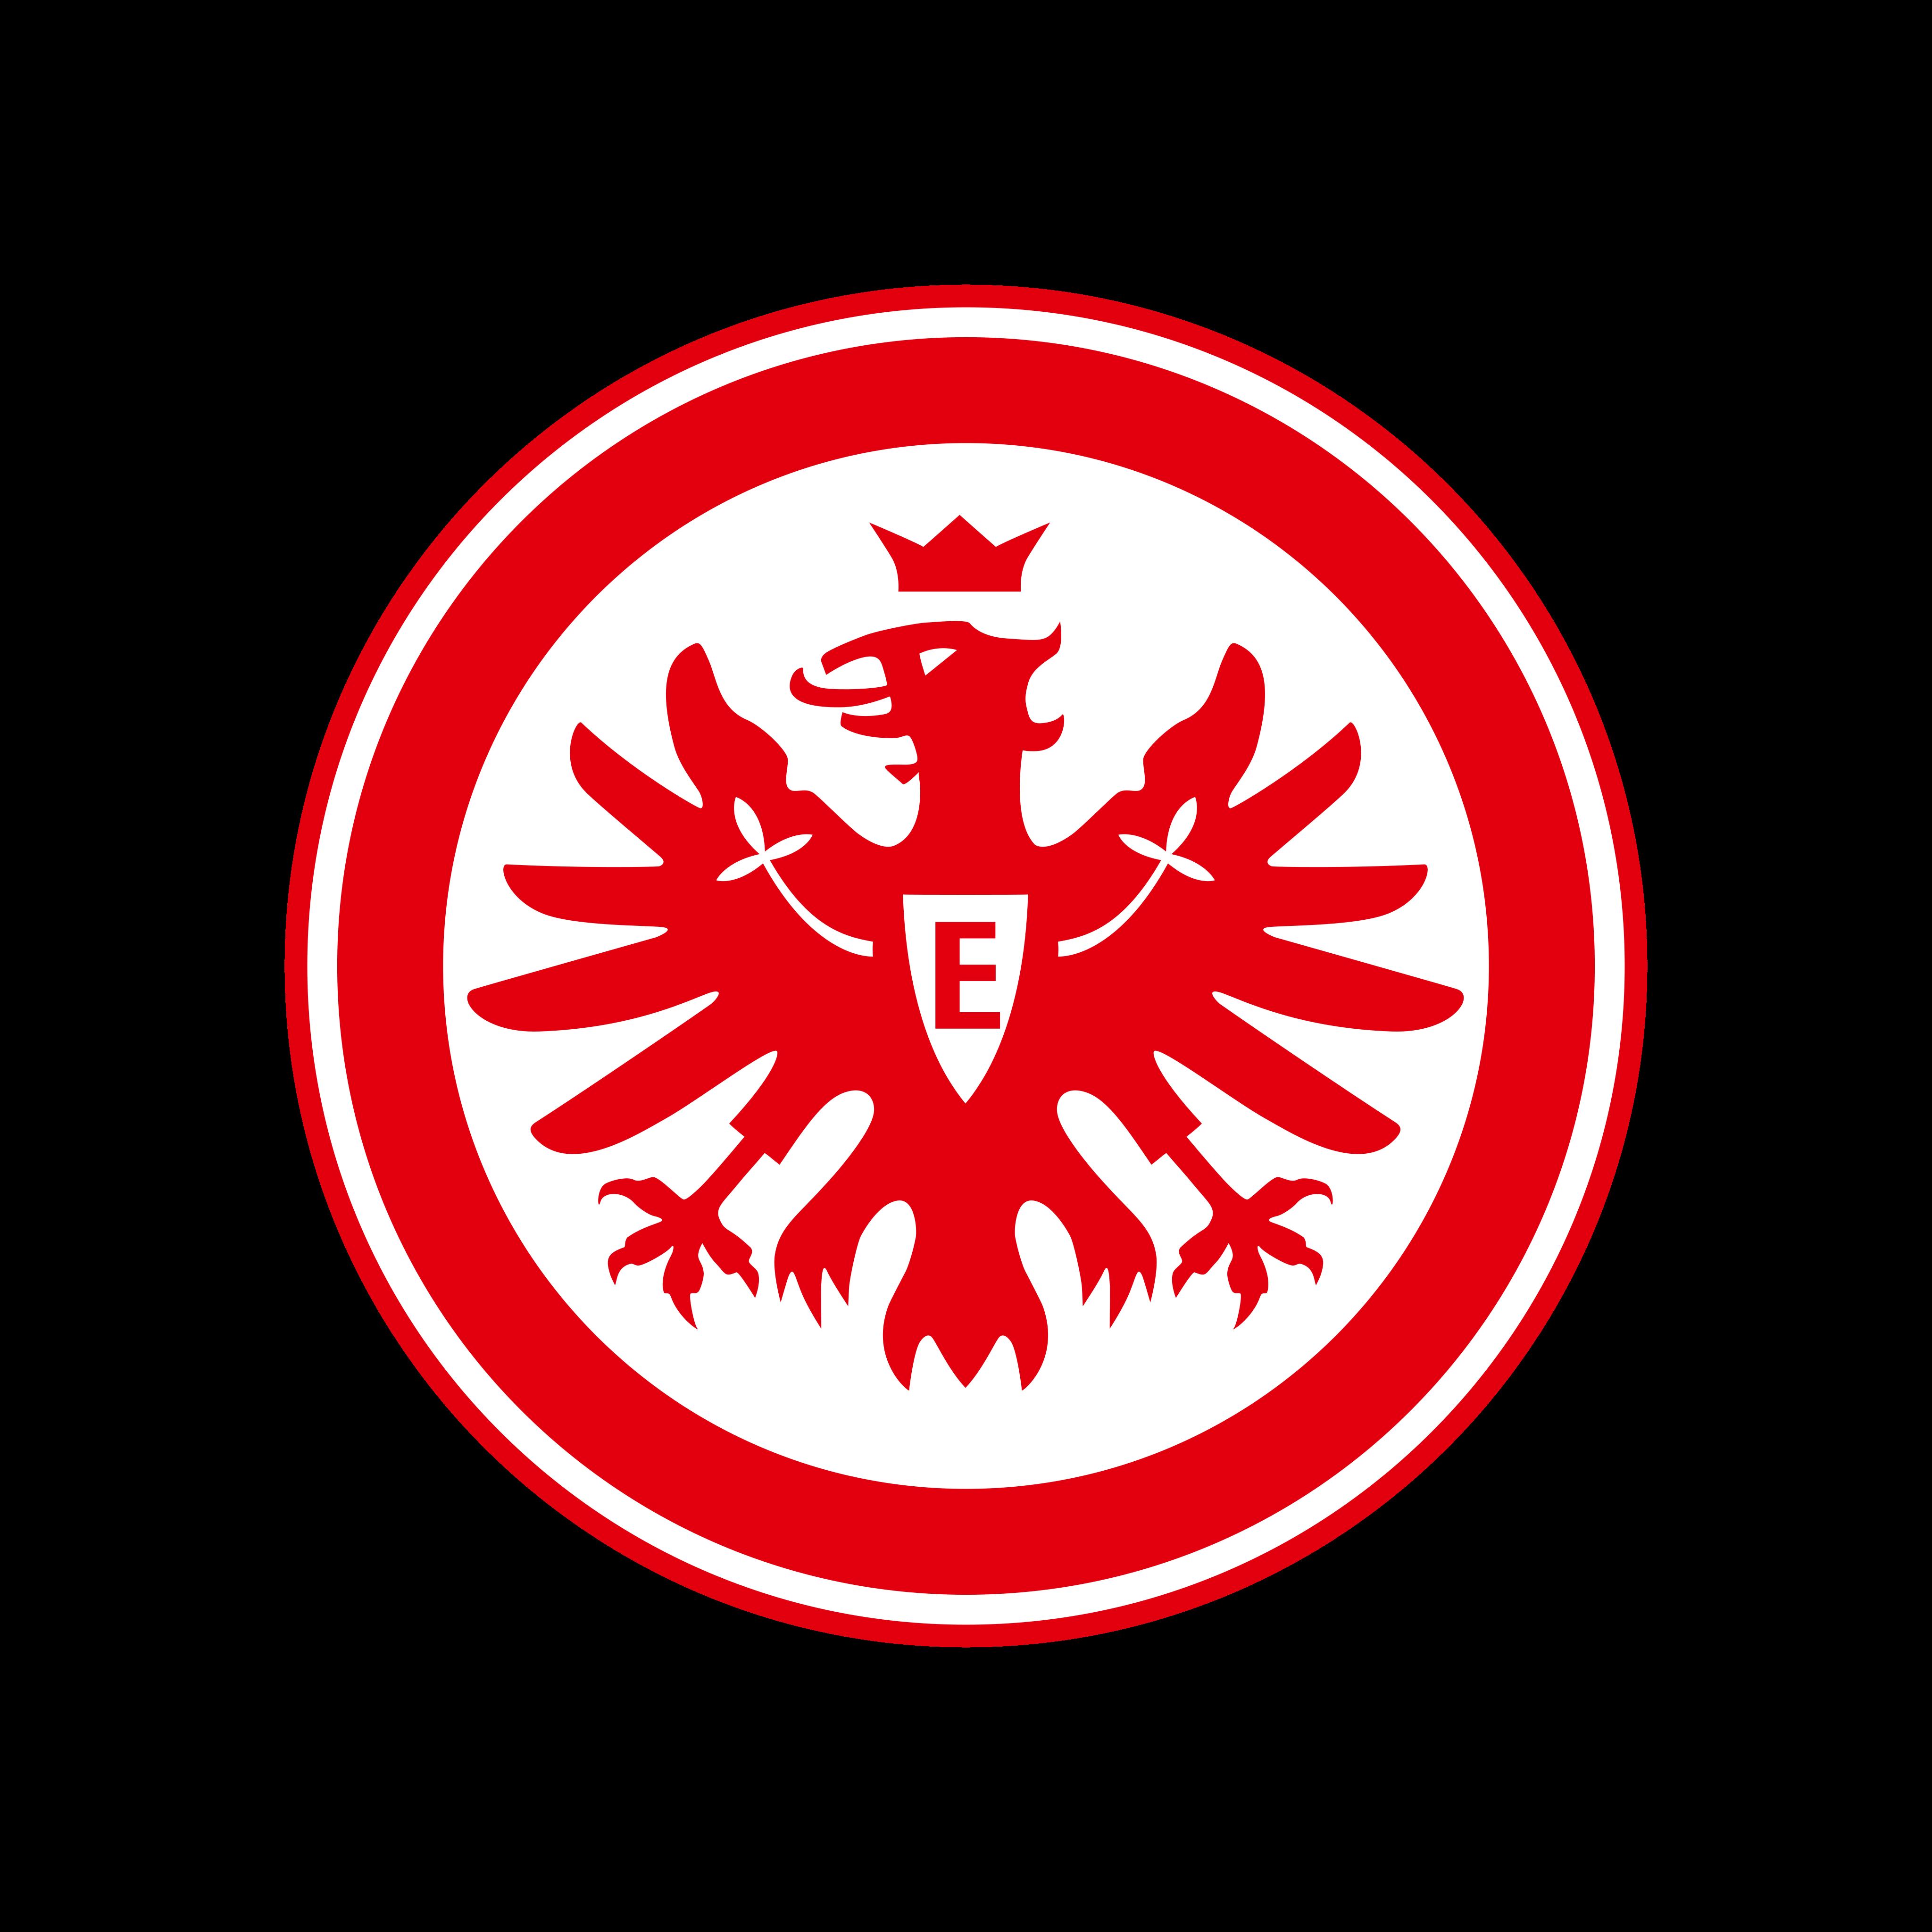 eintracht frankfurt logo 0 - Eintracht Frankfurt Logo